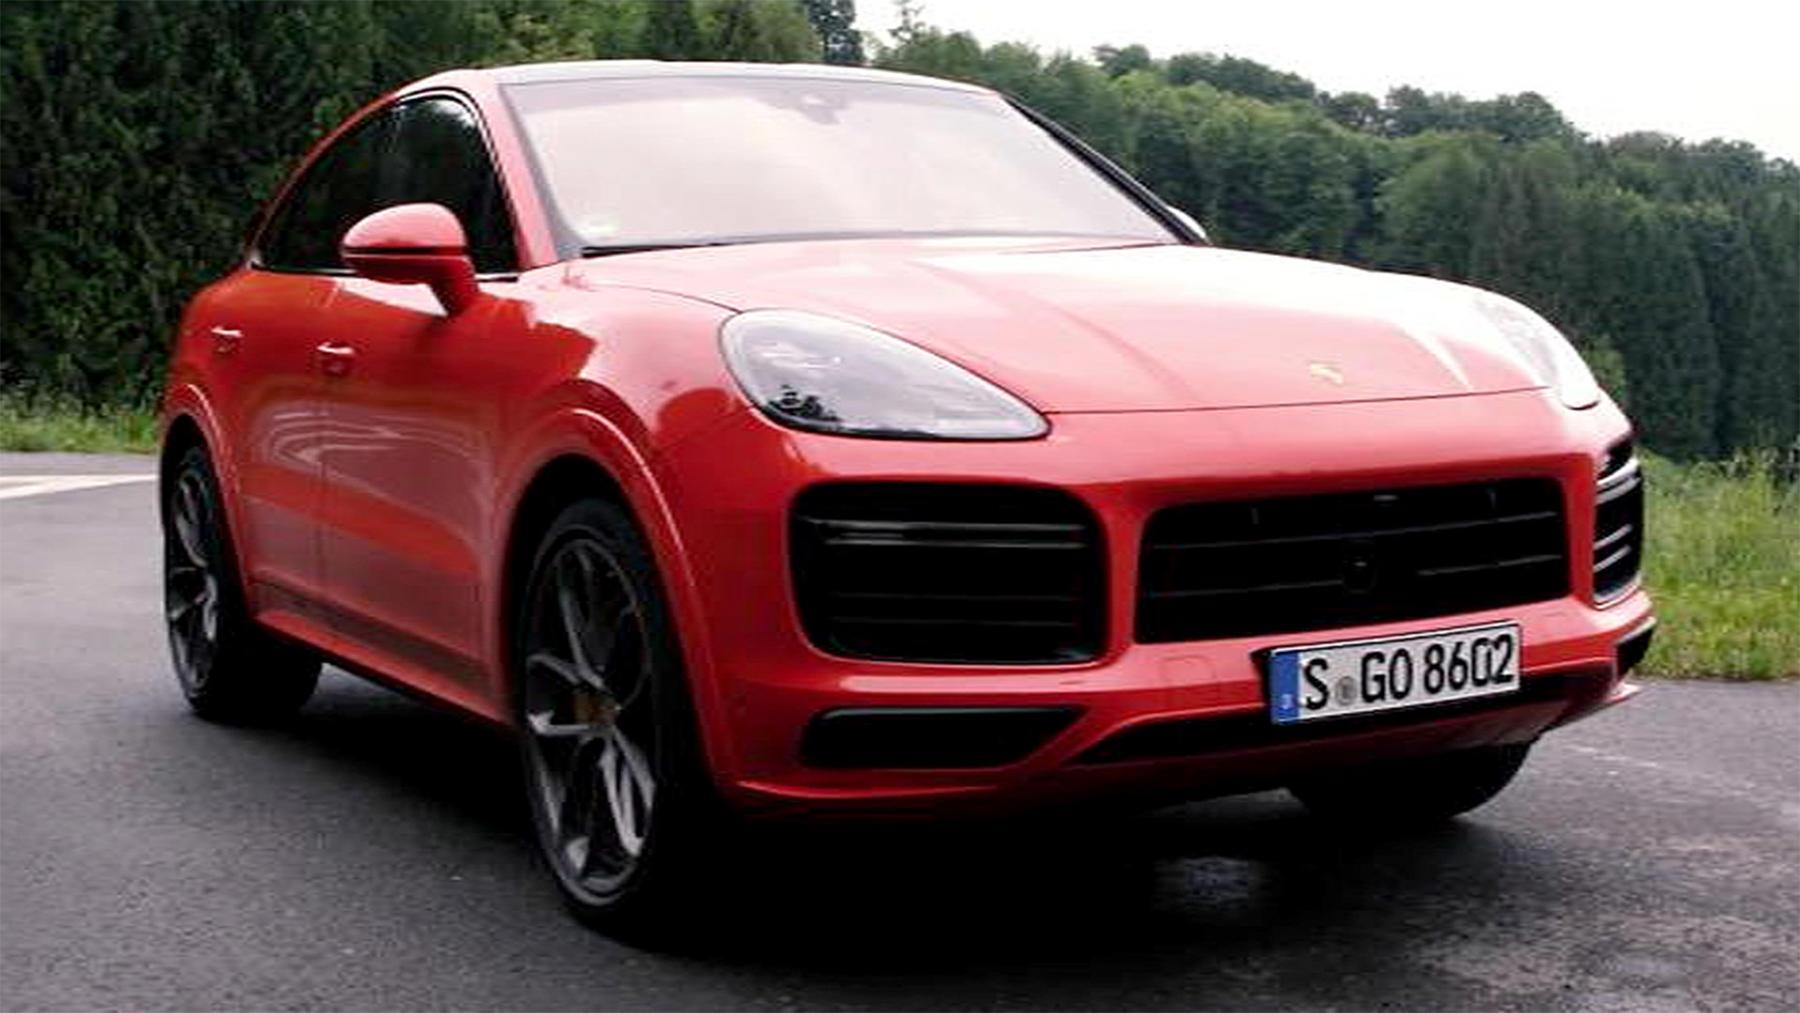 Thema u.a.: Fahrbericht Porsche Cayenne Coupé | Folge 25